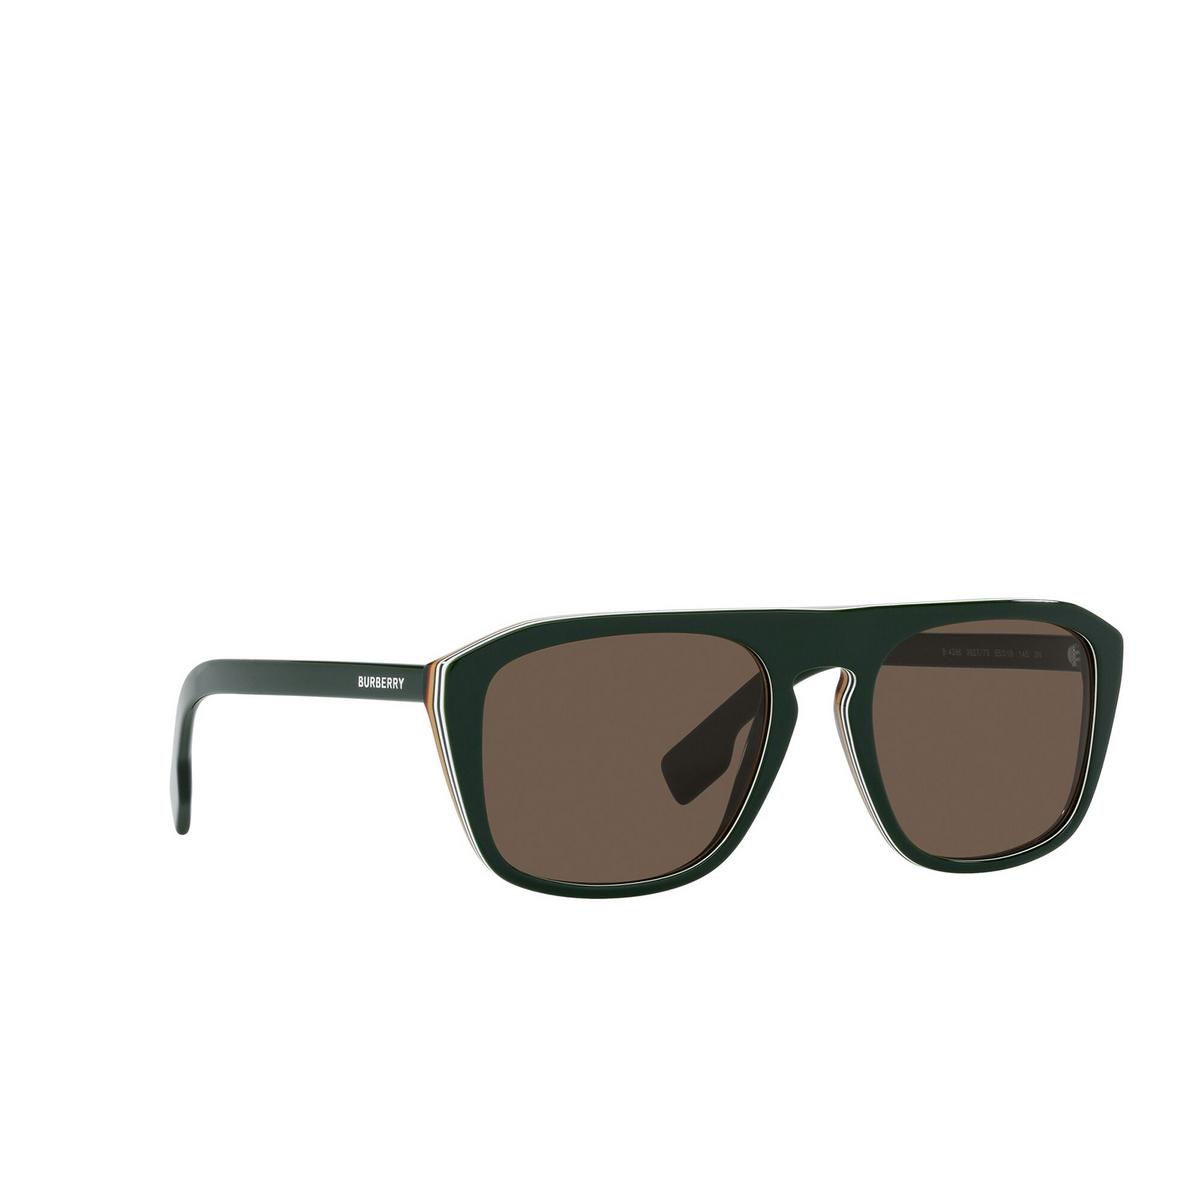 Burberry® Square Sunglasses: BE4286 color Green 392773 - three-quarters view.